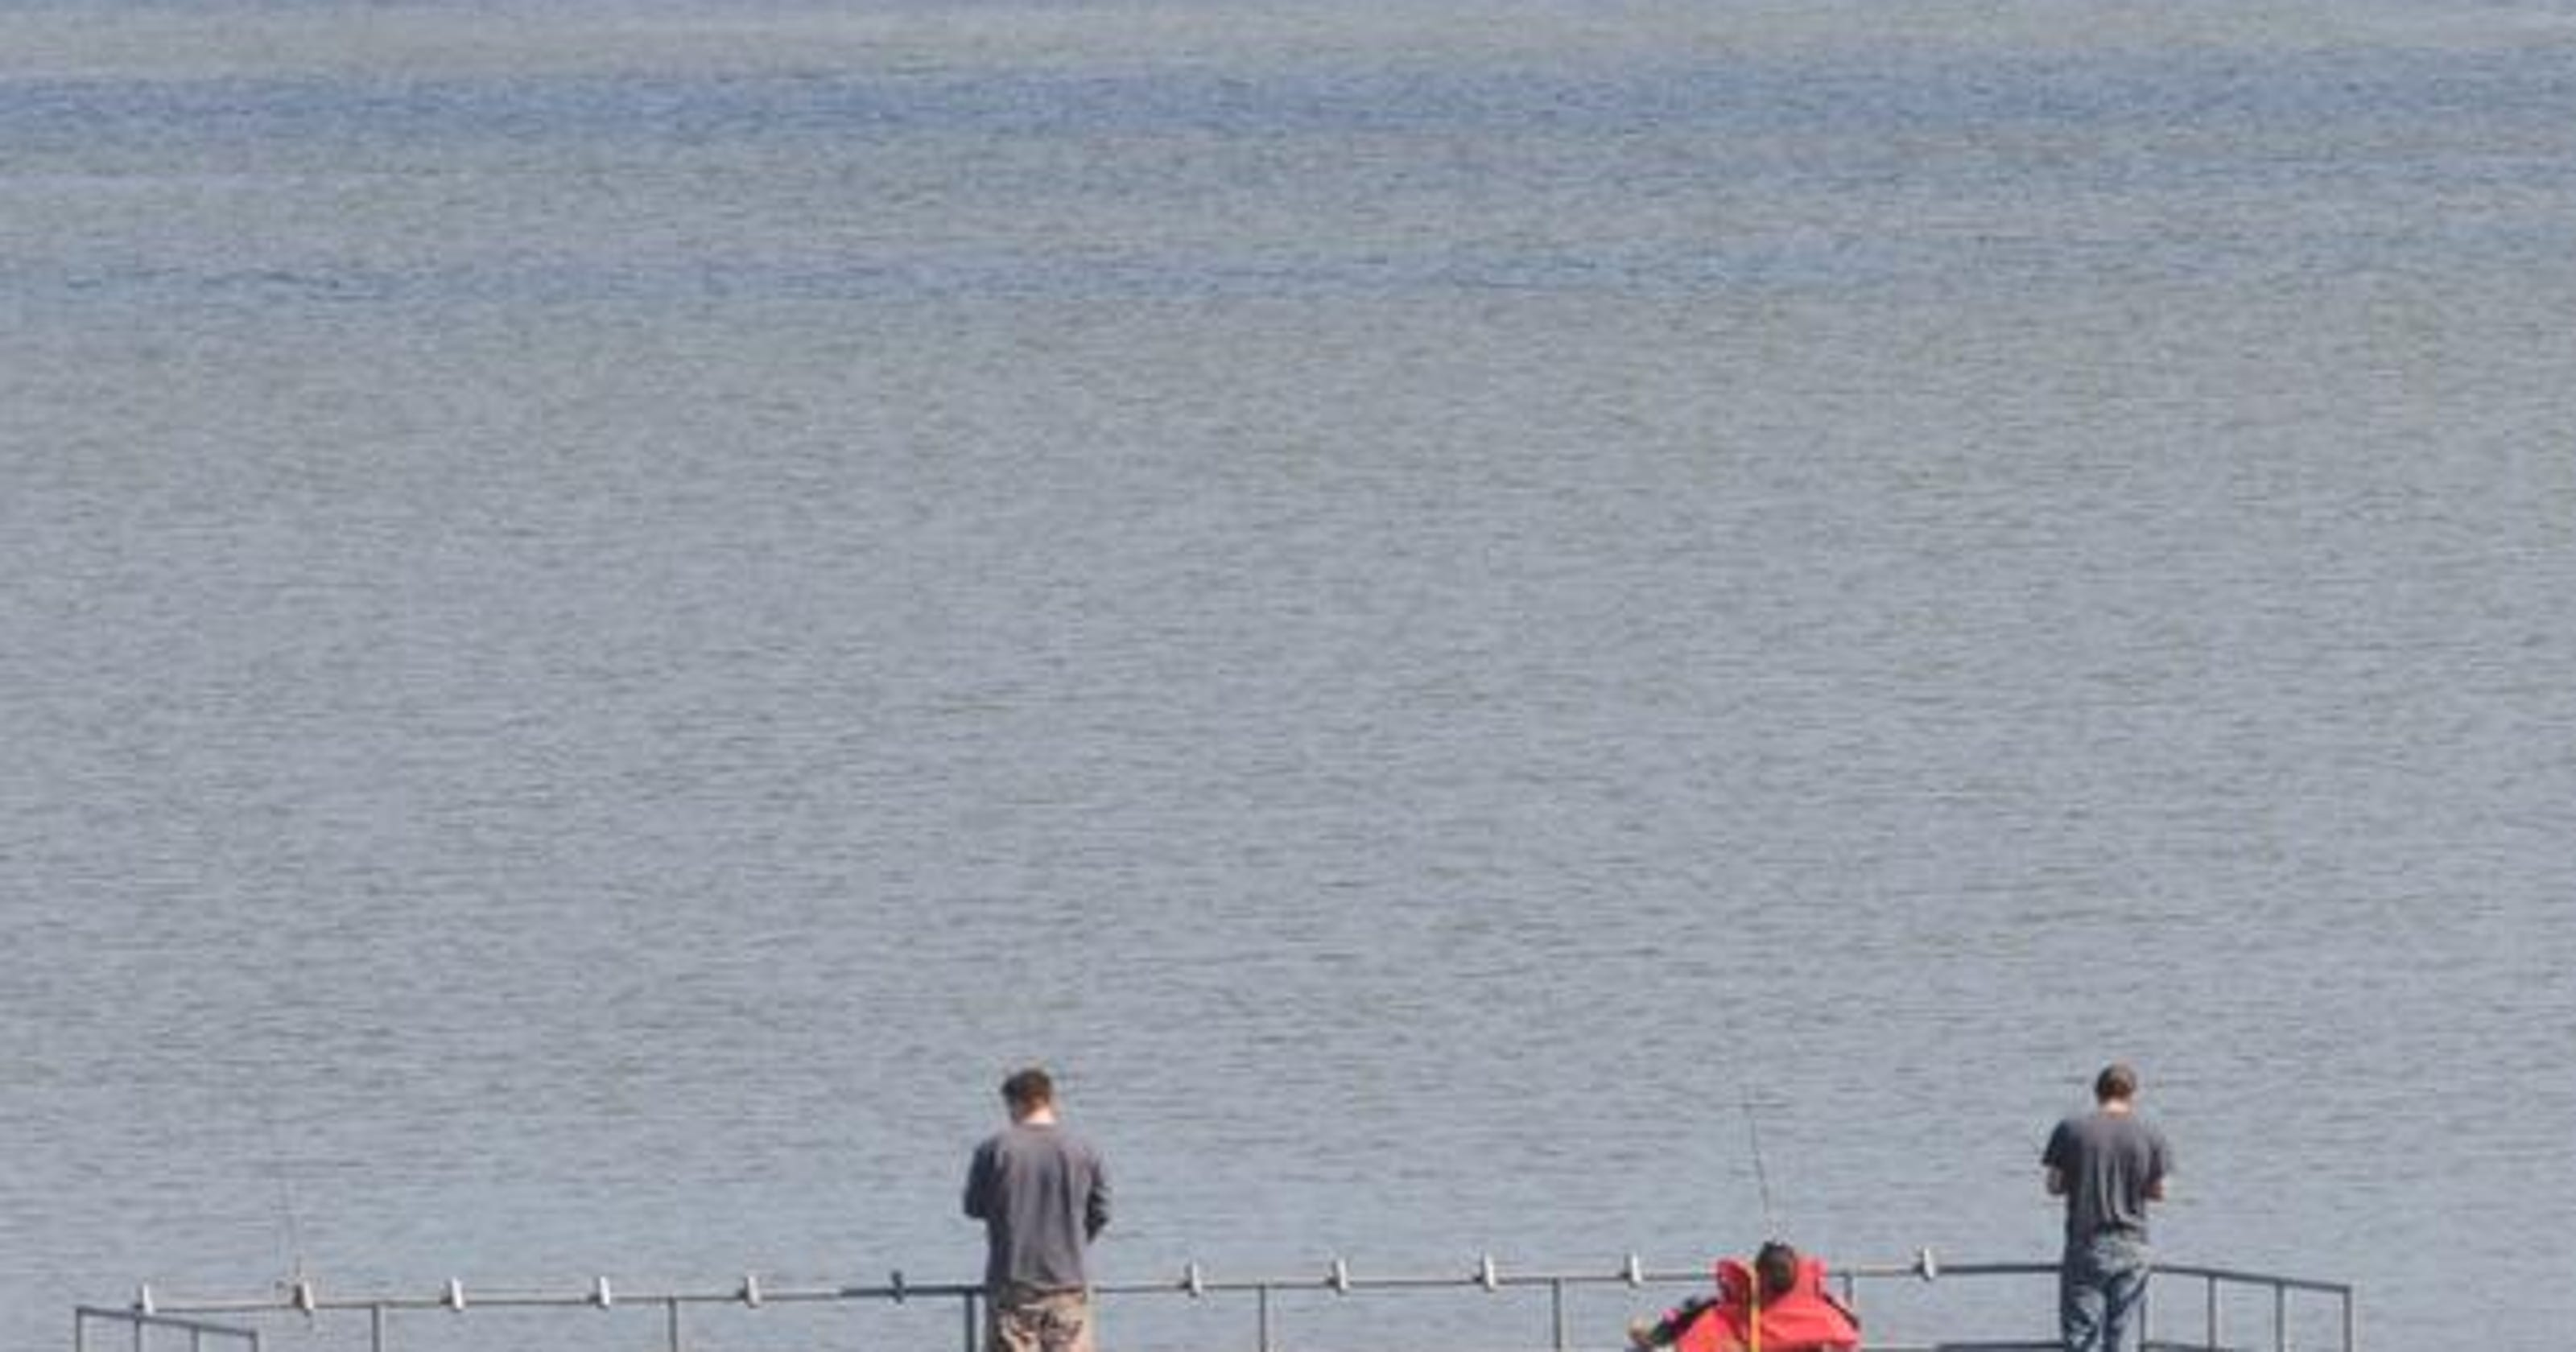 Walleye Fishing Going Well Near Islands